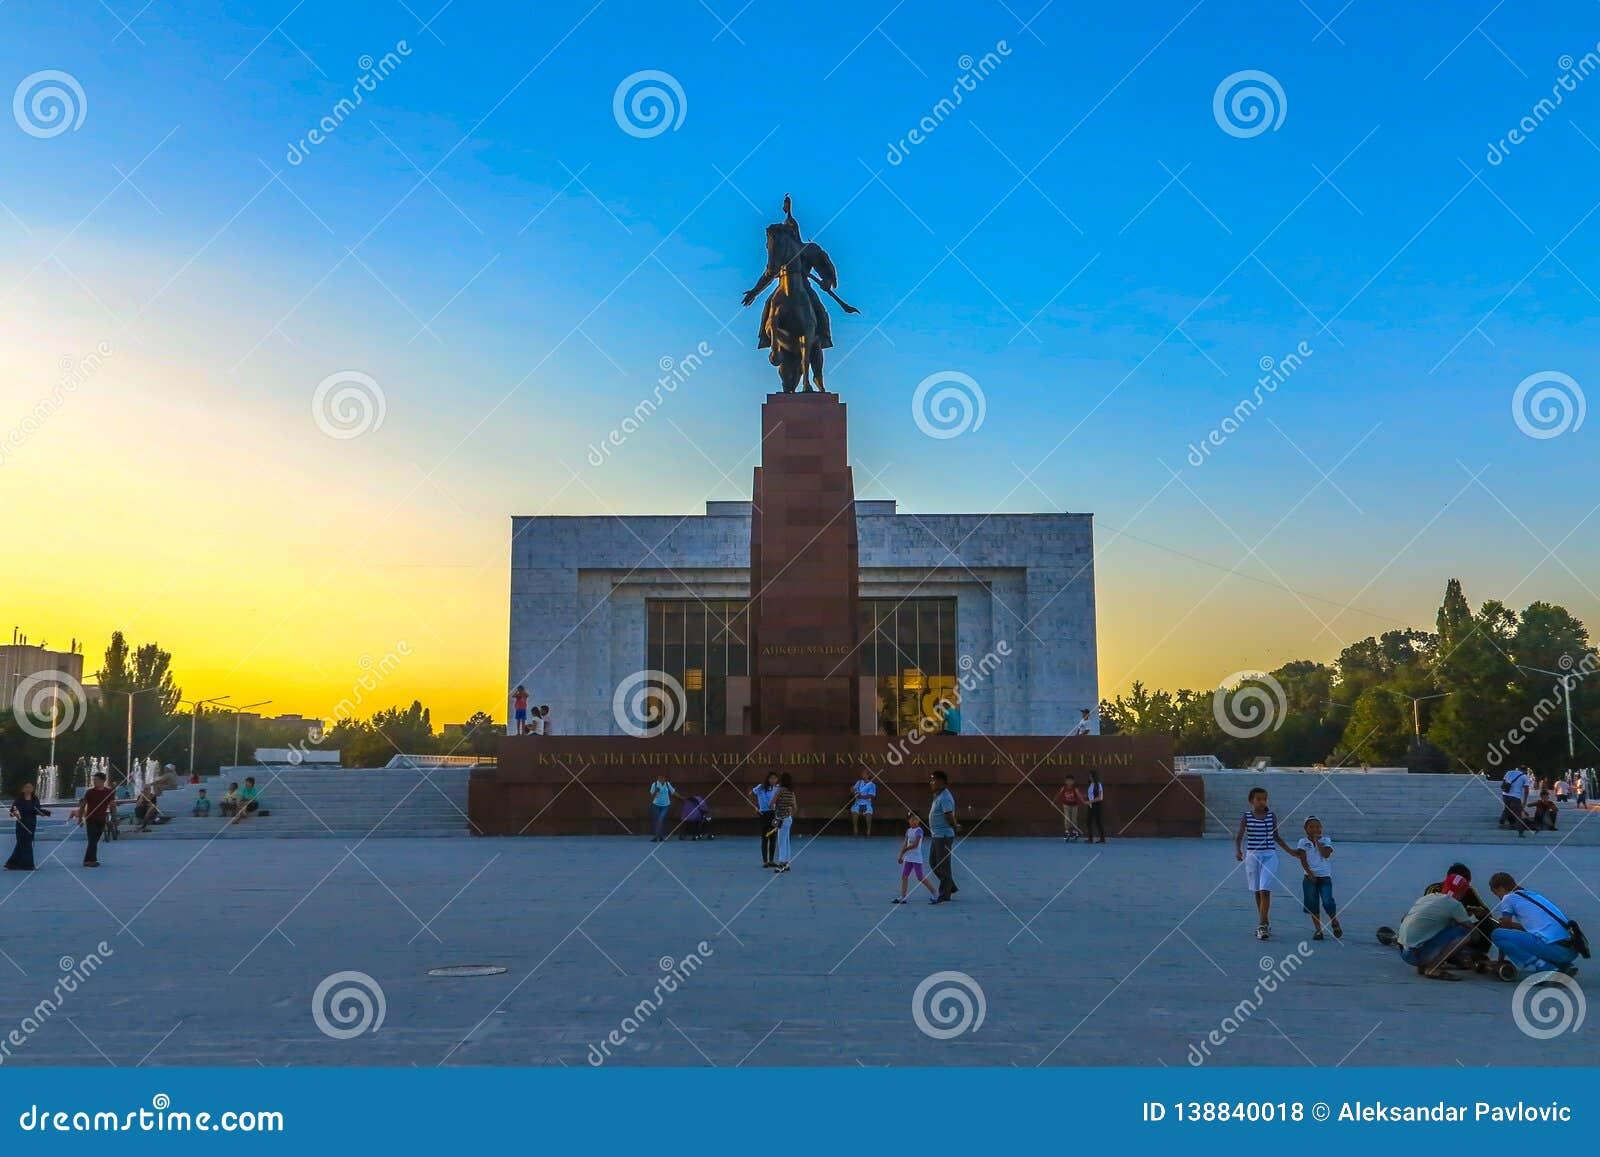 Bishkek Ala Too Square 09